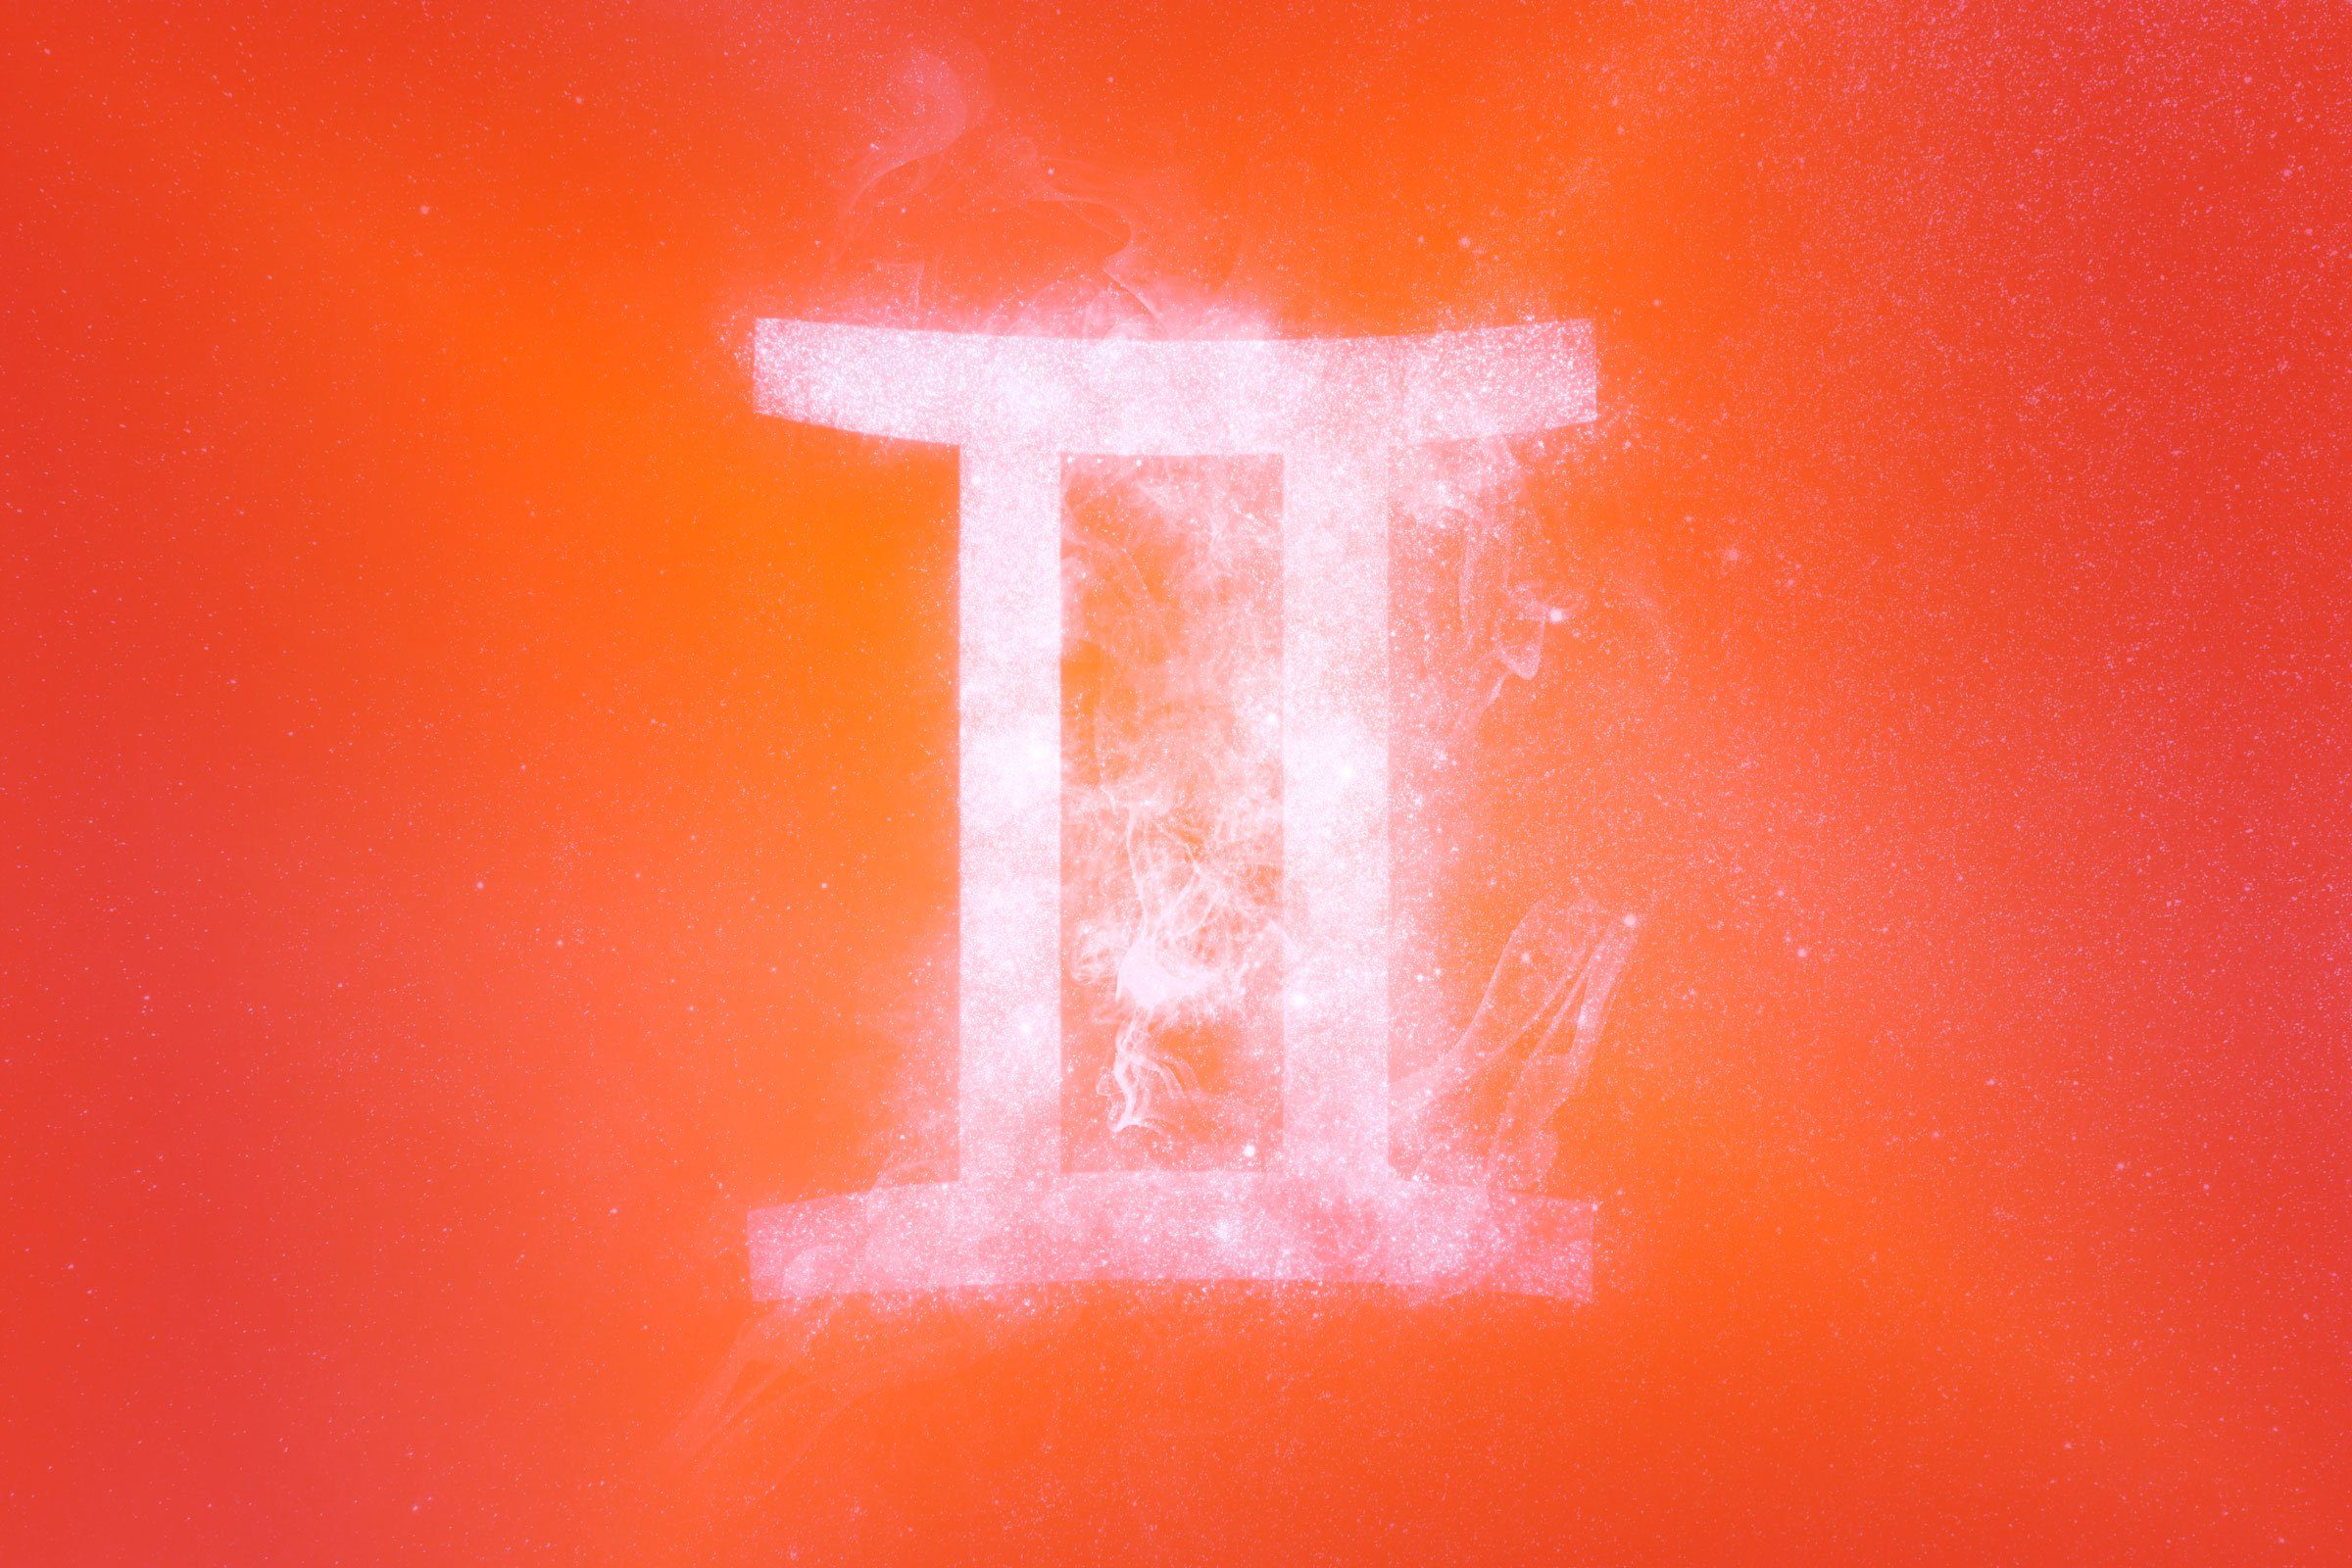 gemini symbol with red-orange gradient overlay